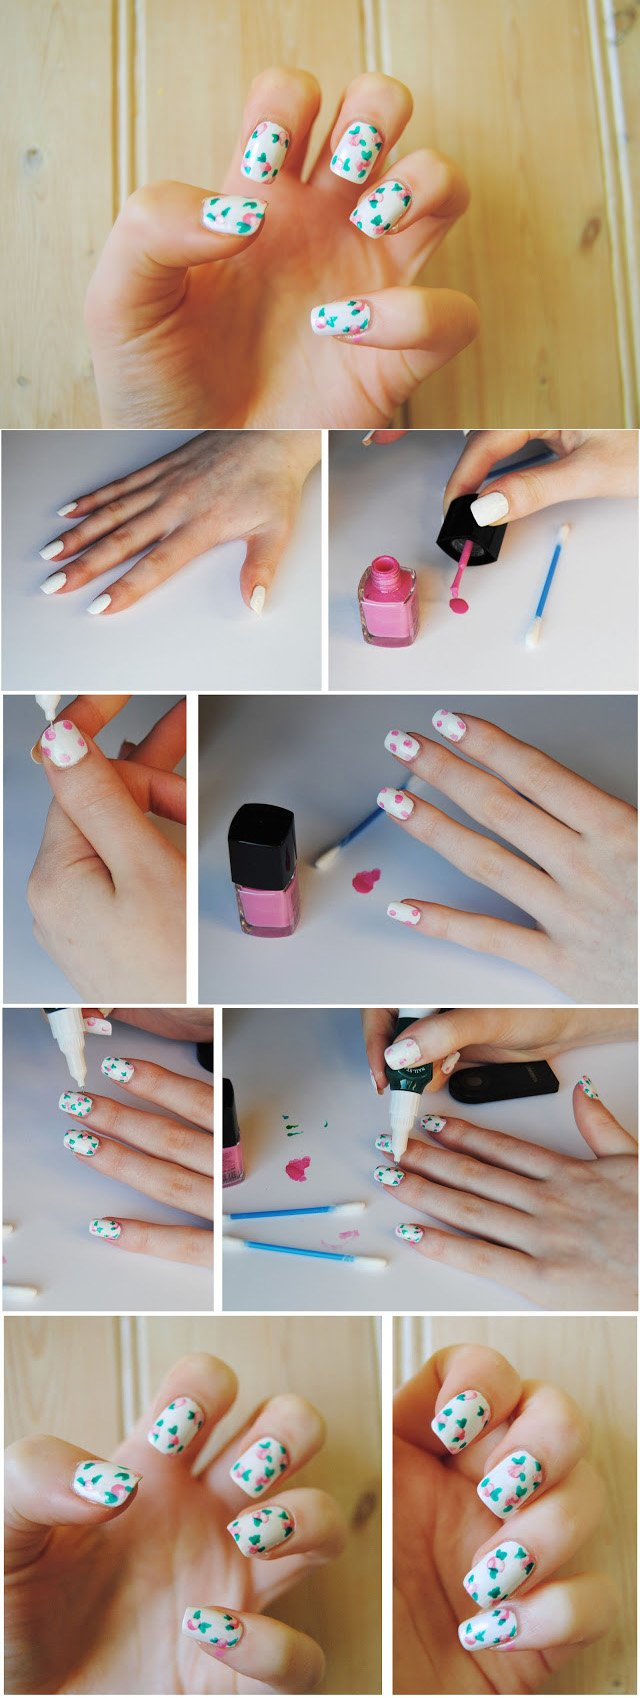 Pretty Floral Nails DIY